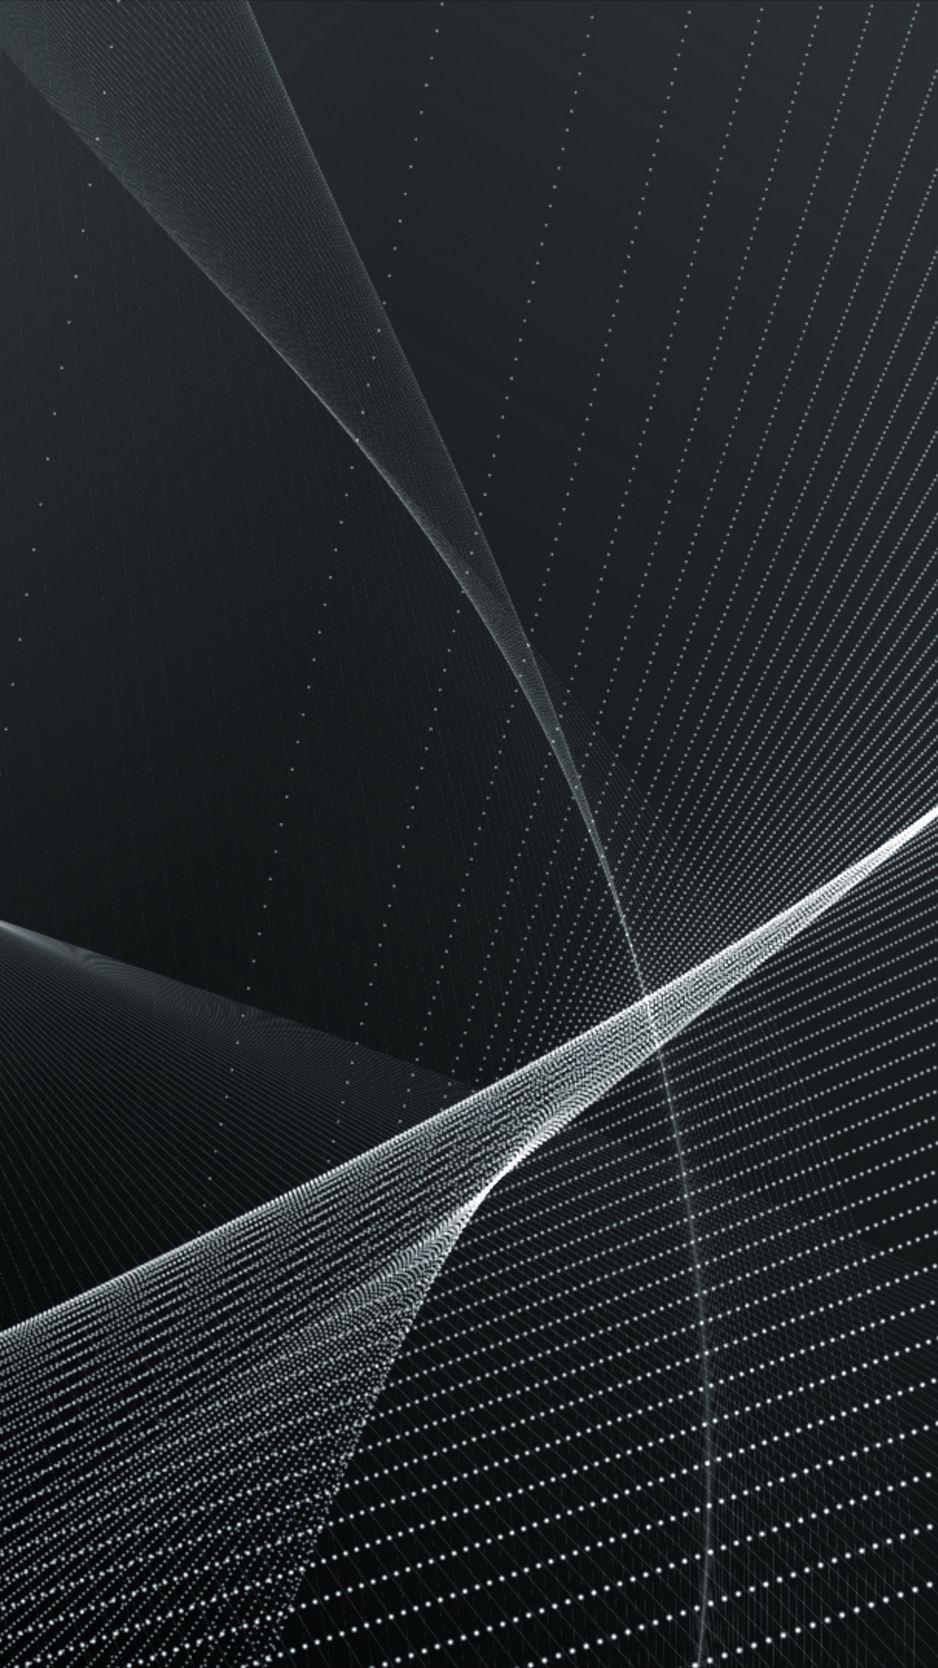 Https Www Backgroundscool Com Abstract Lines Stripes Blurred Black Background Wallpaper Black Background Wallpaper Cool Backgrounds Abstract